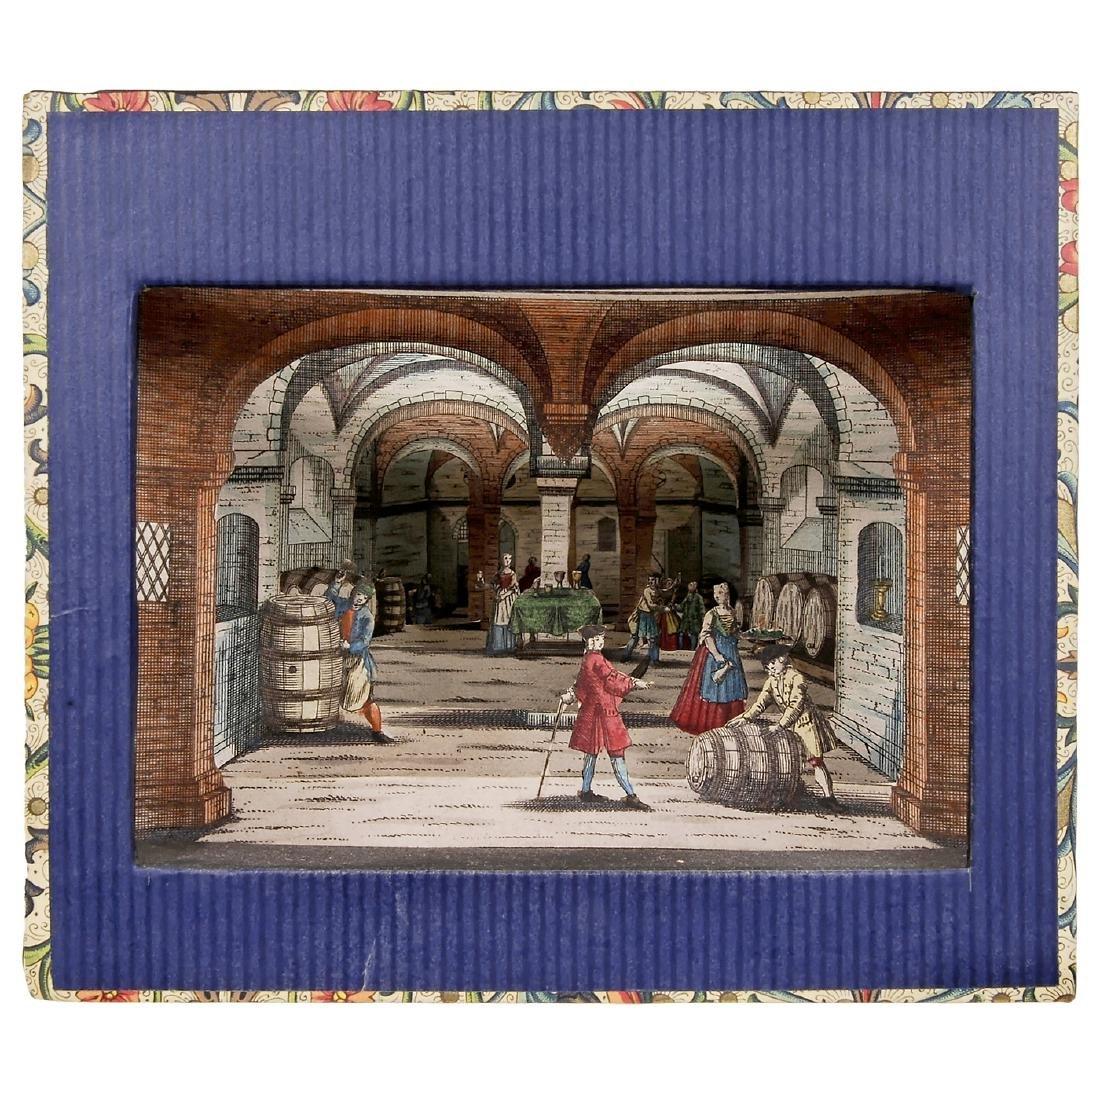 Perspective View Box Diorama, c. 1850 -70